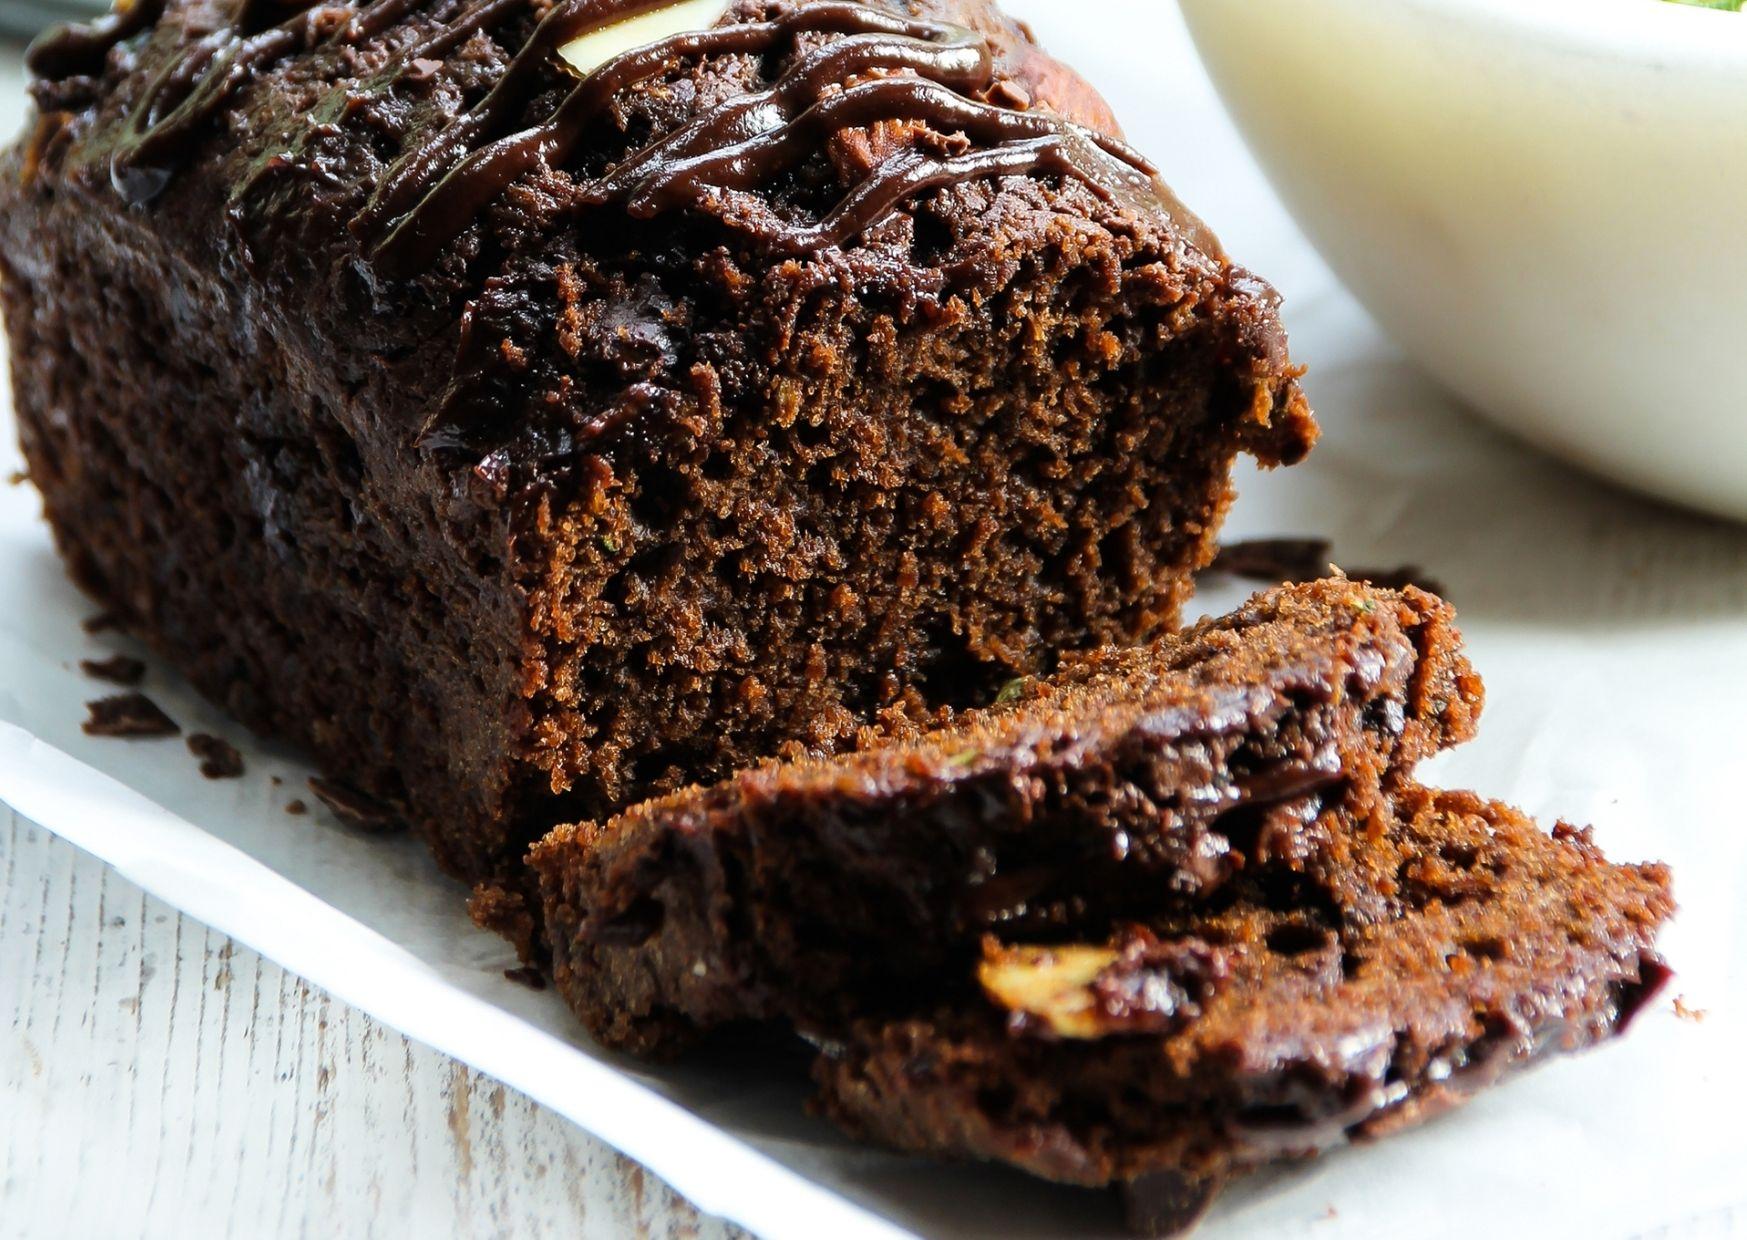 Panes caseros de chocolate o pan de chocolate